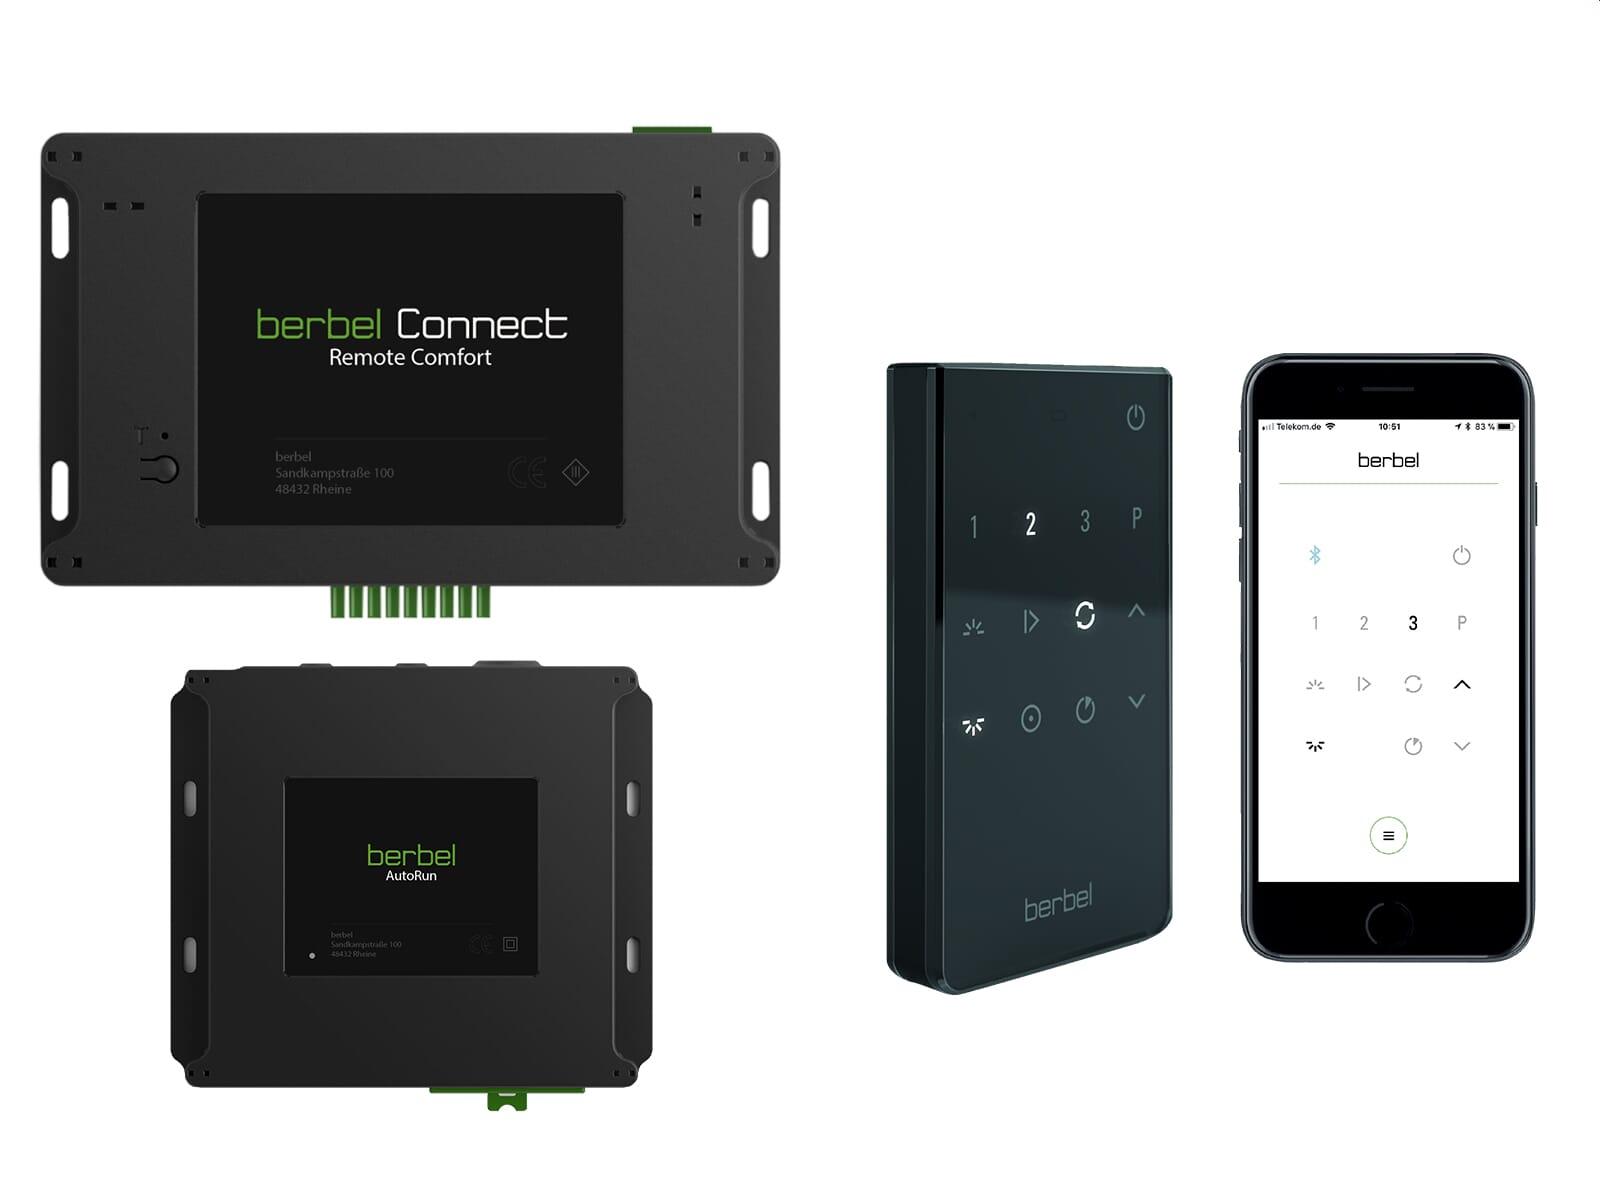 Berbel 1090014 Connect - Remote Comfort